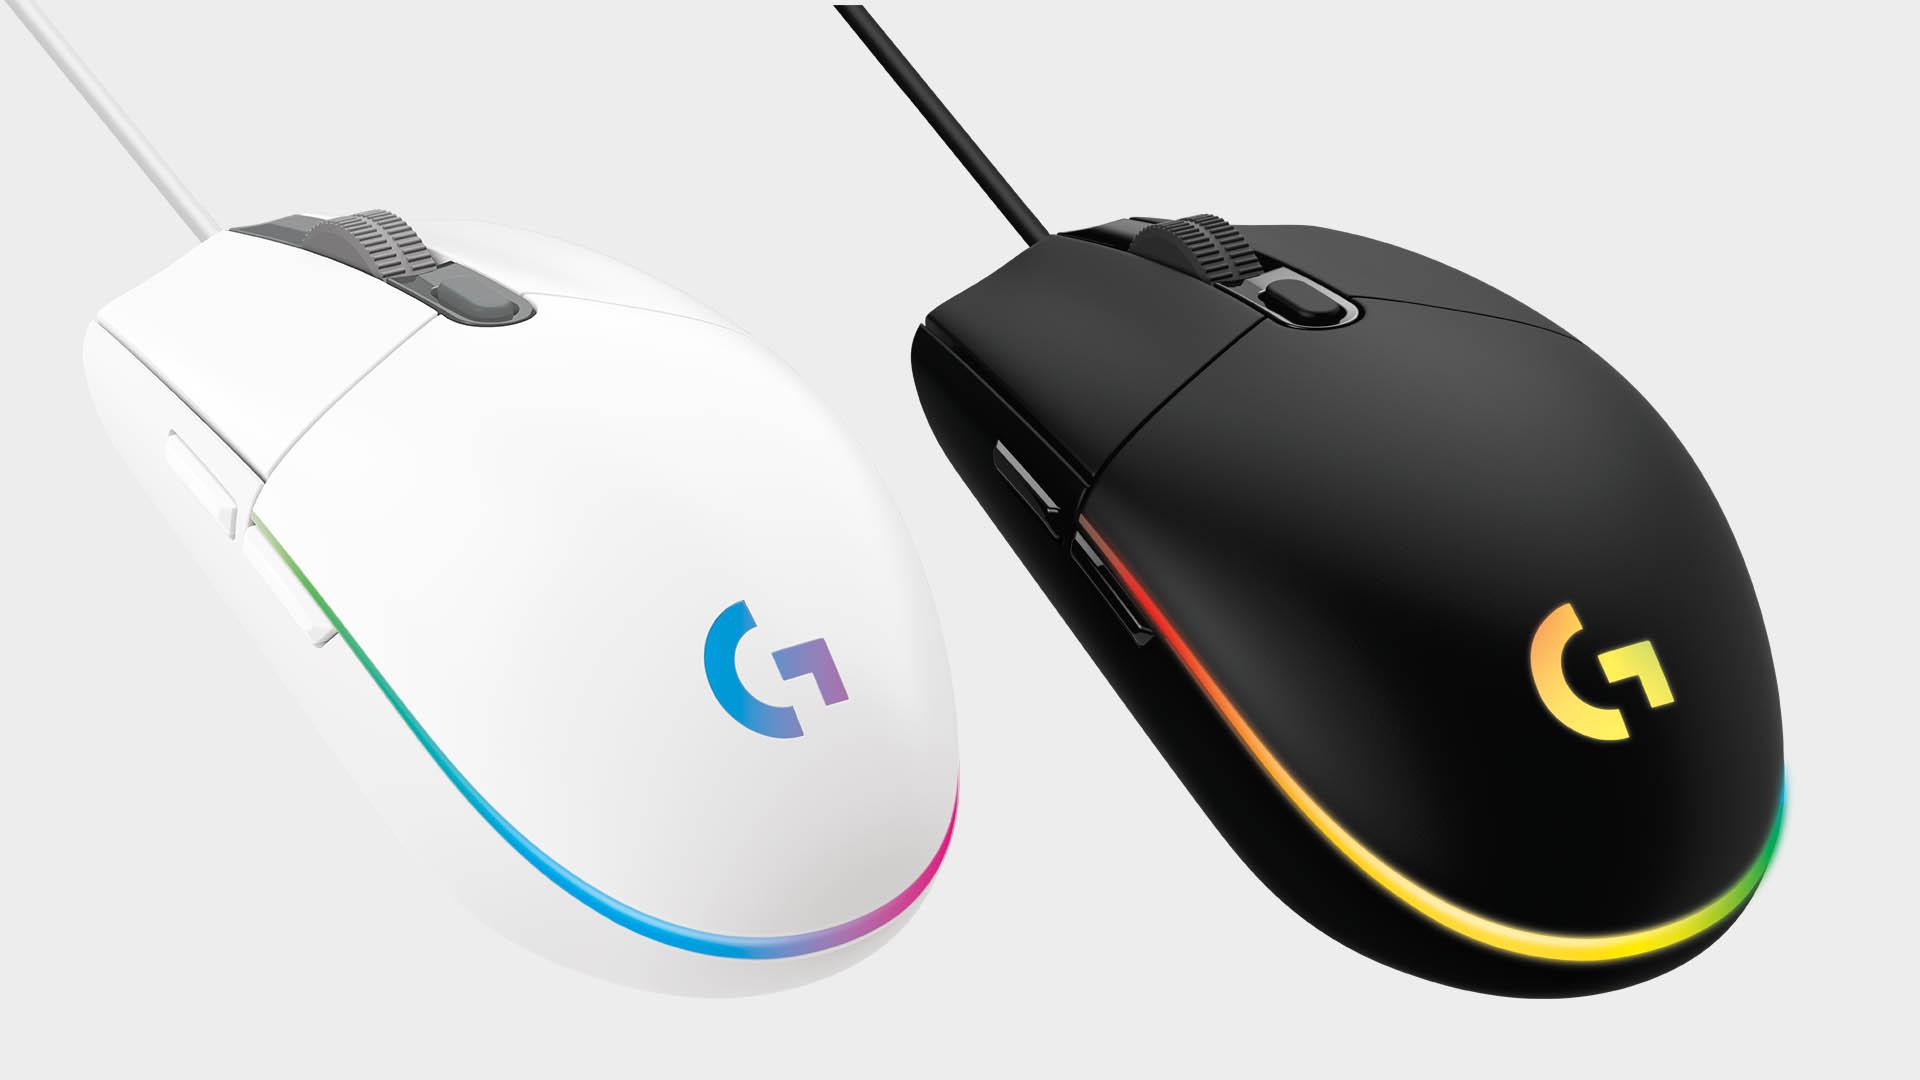 Logitech G203 Lightsync gaming mouse